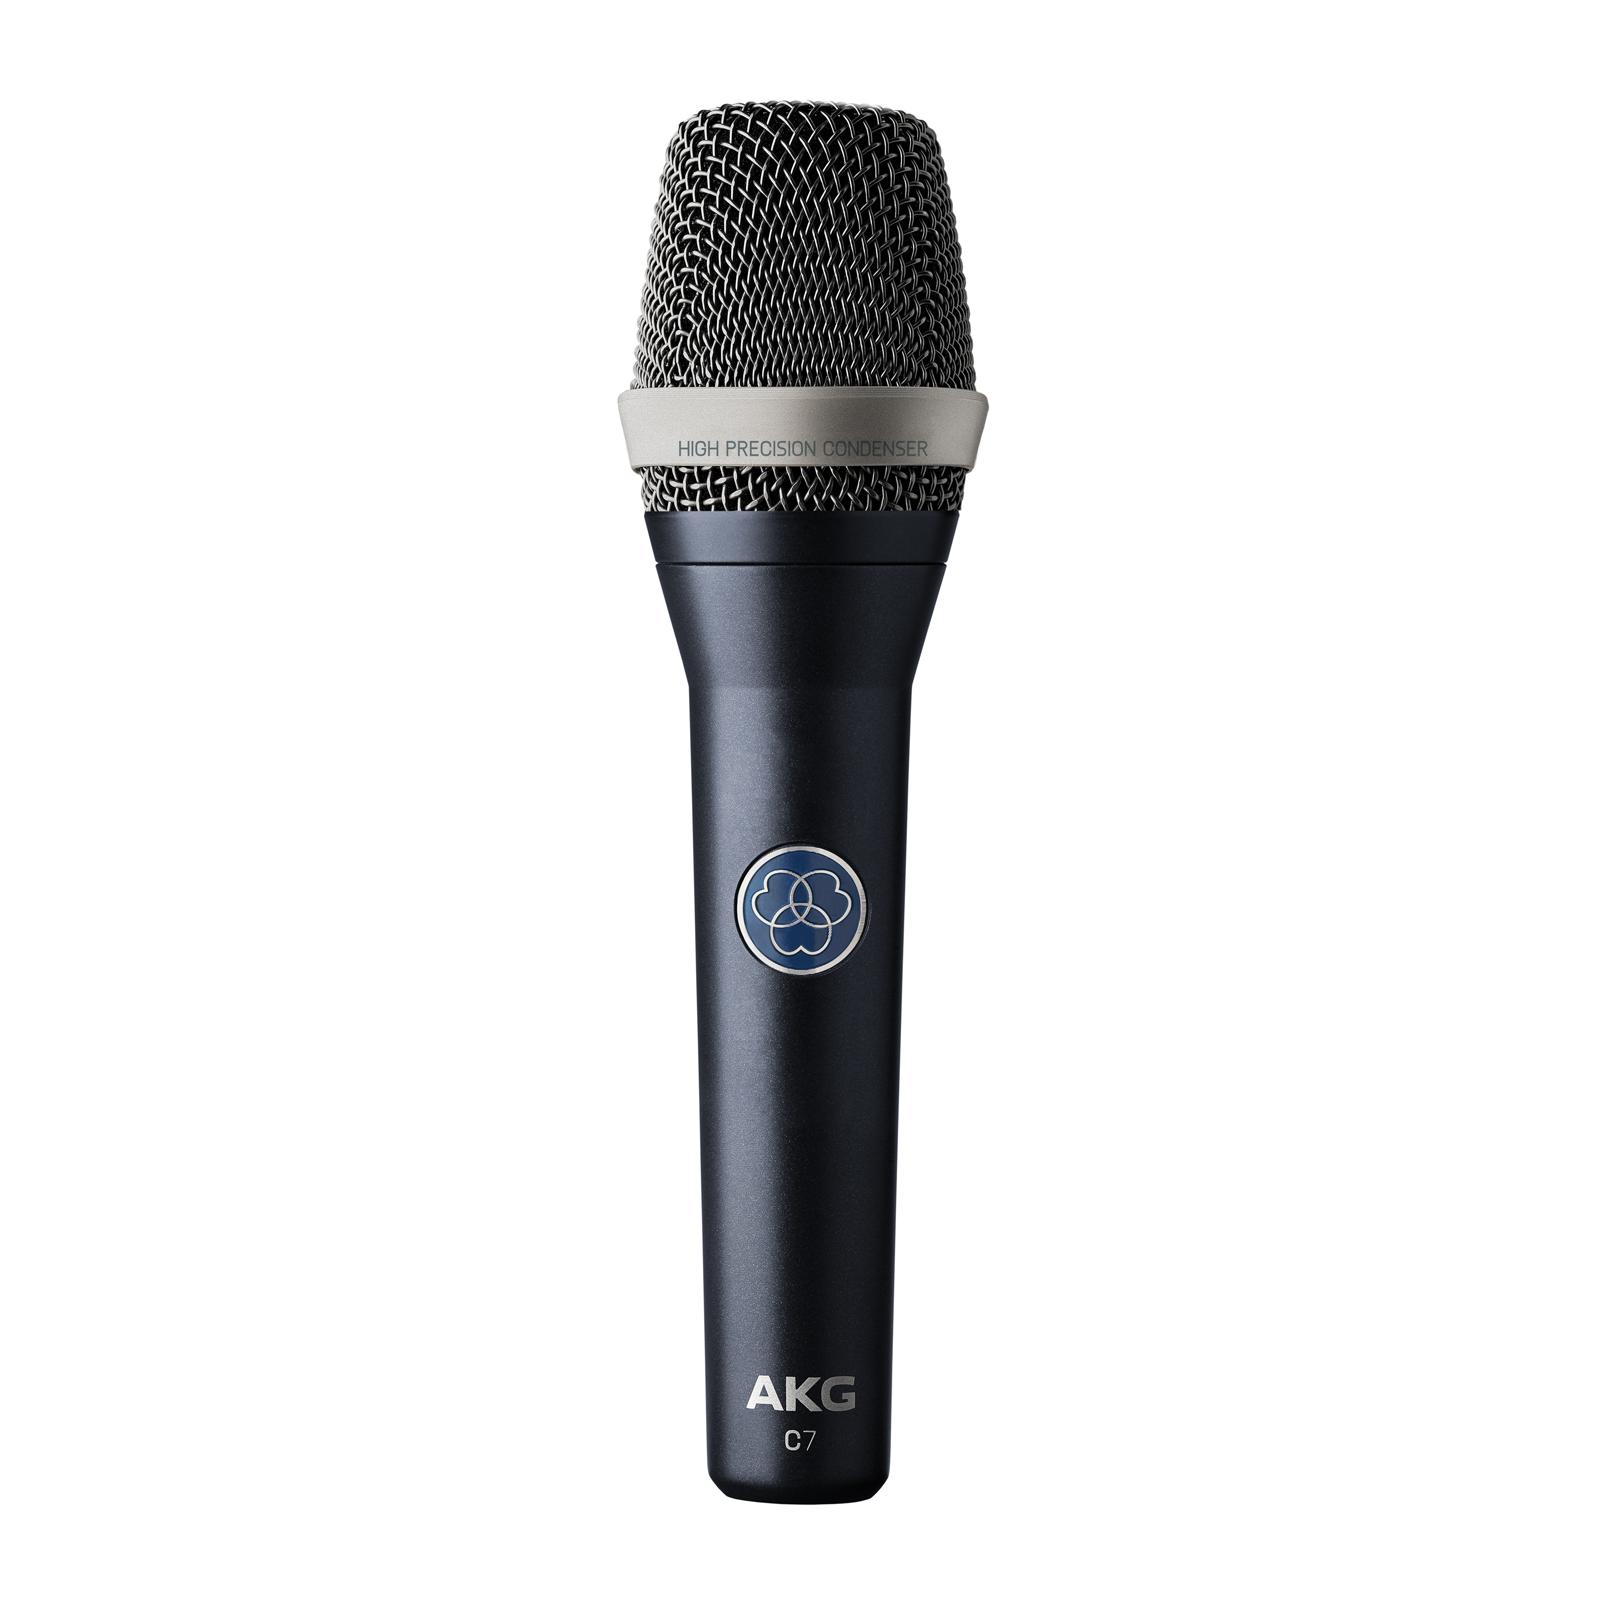 C7 - Matte-Grayish-Blue - Reference condenser vocal microphone - Hero